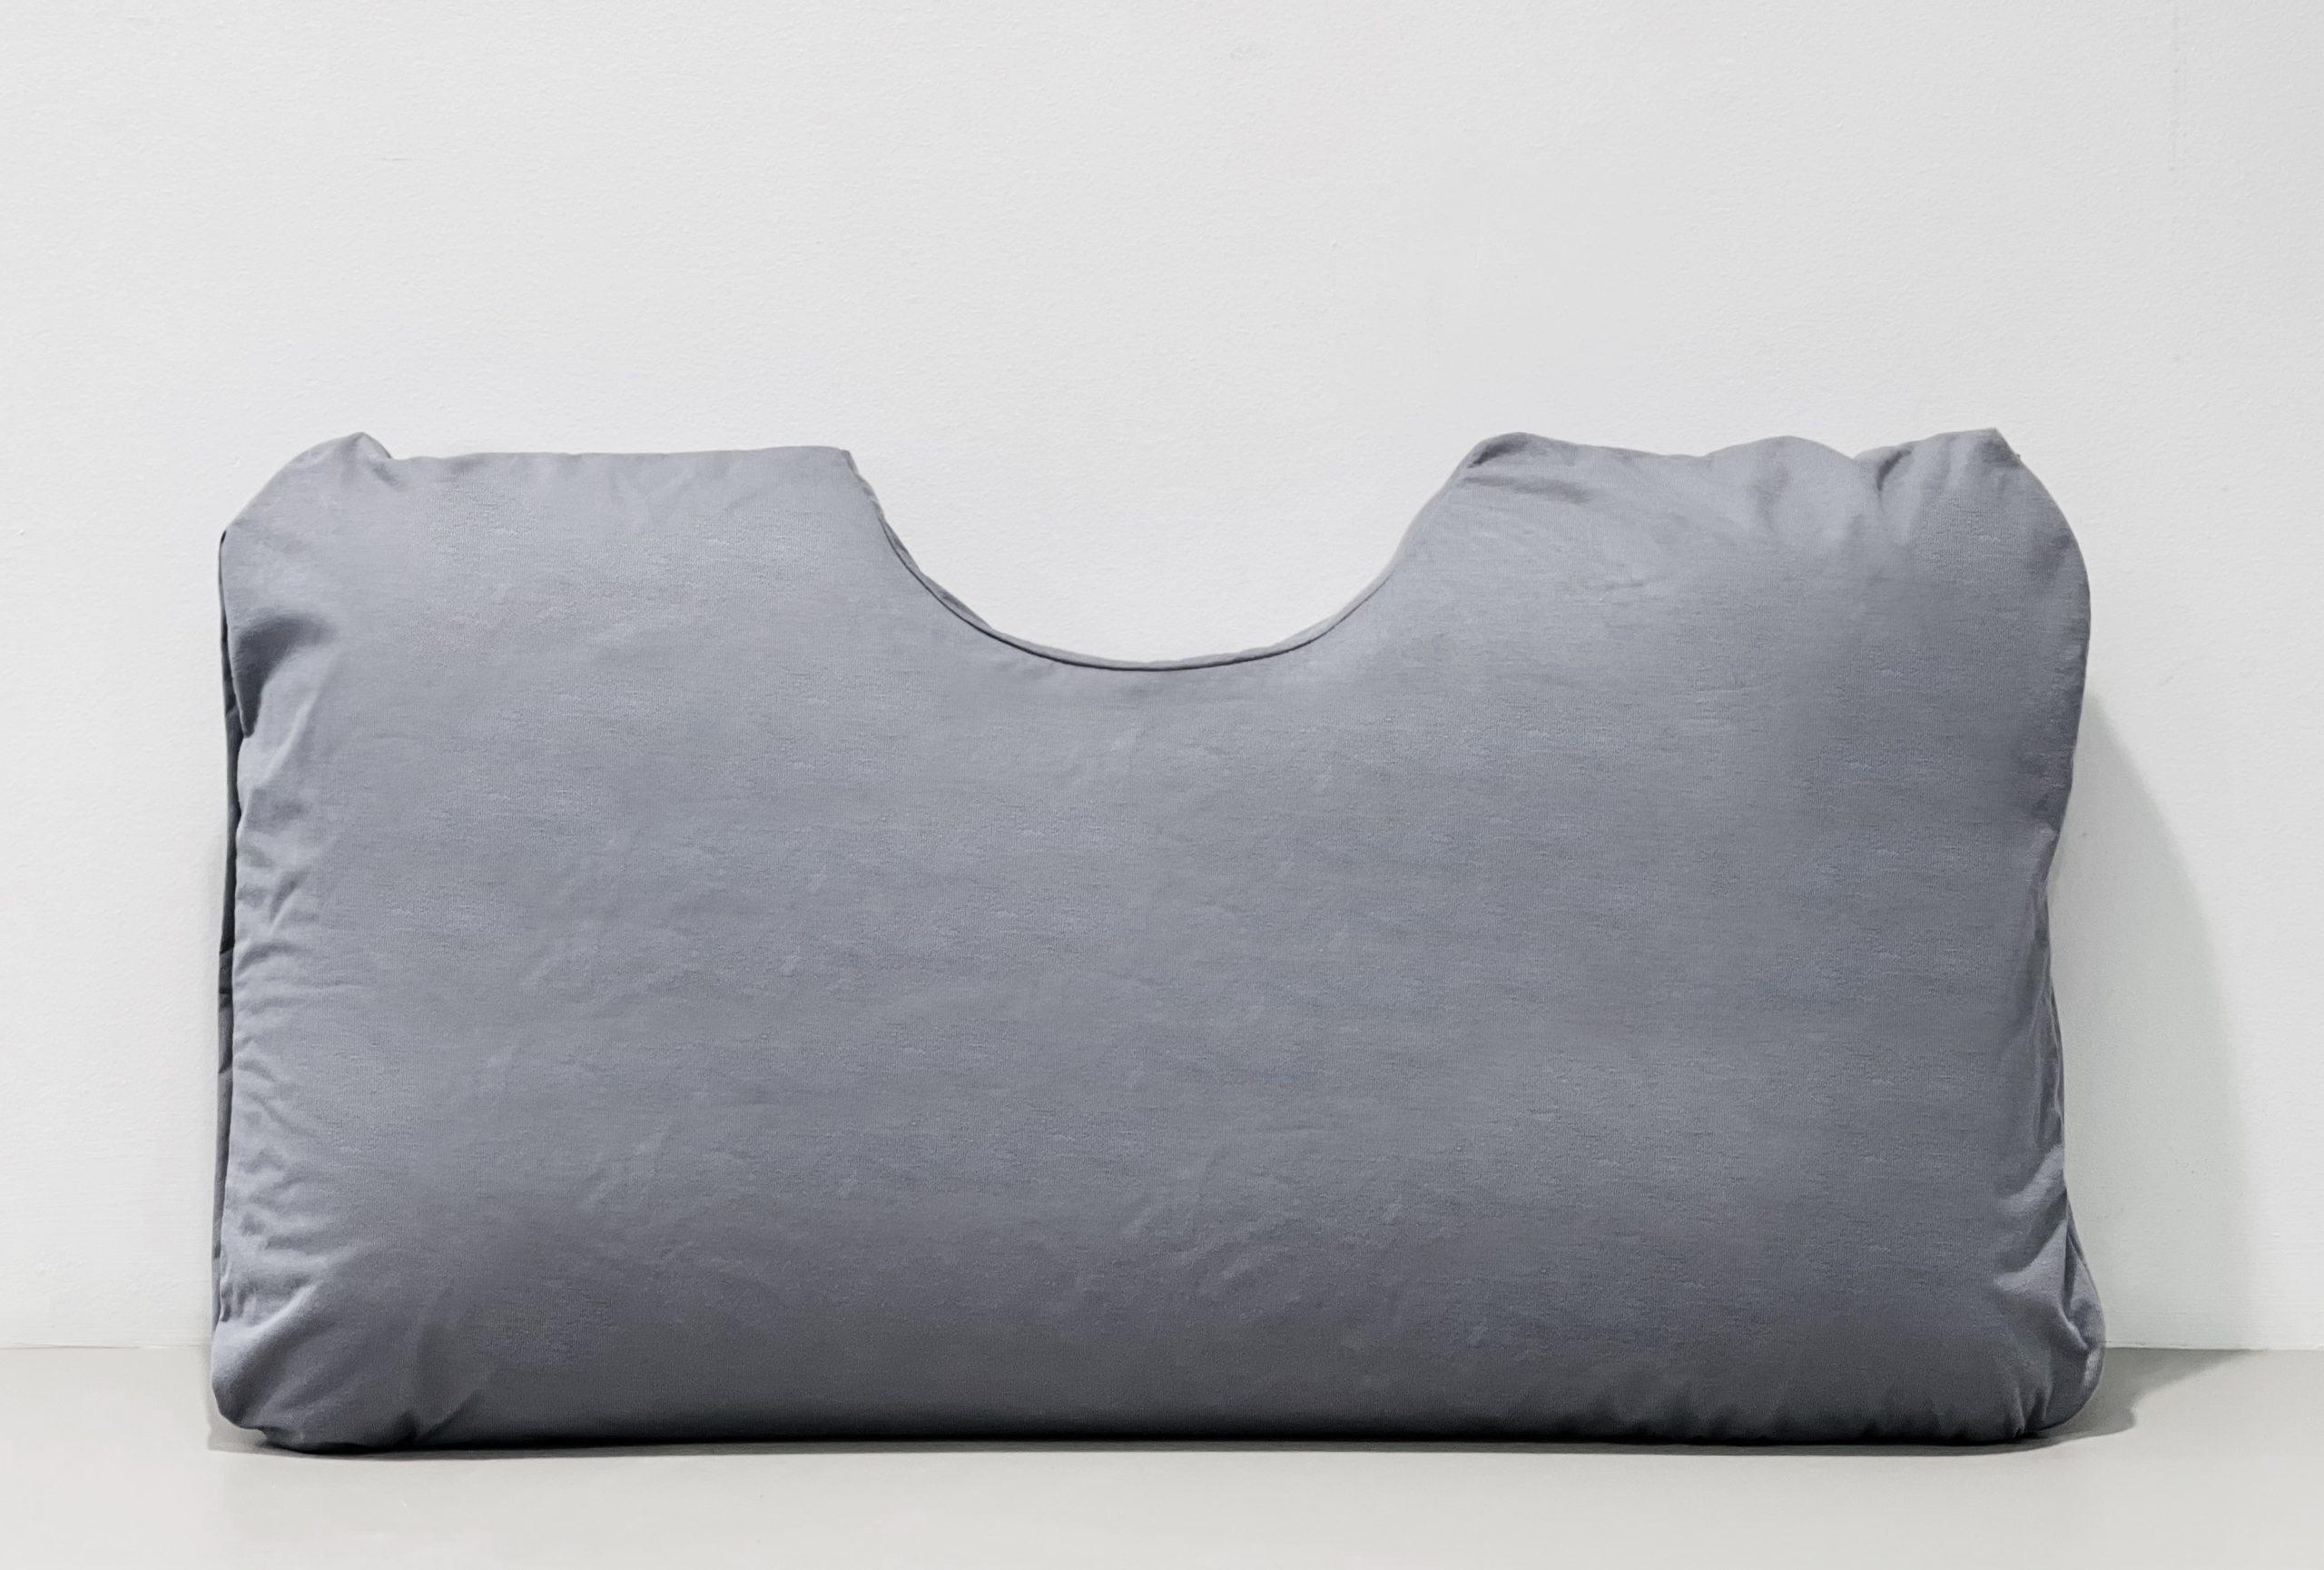 Moonshadow Tencel Shoulder Cut Out Pillow Case